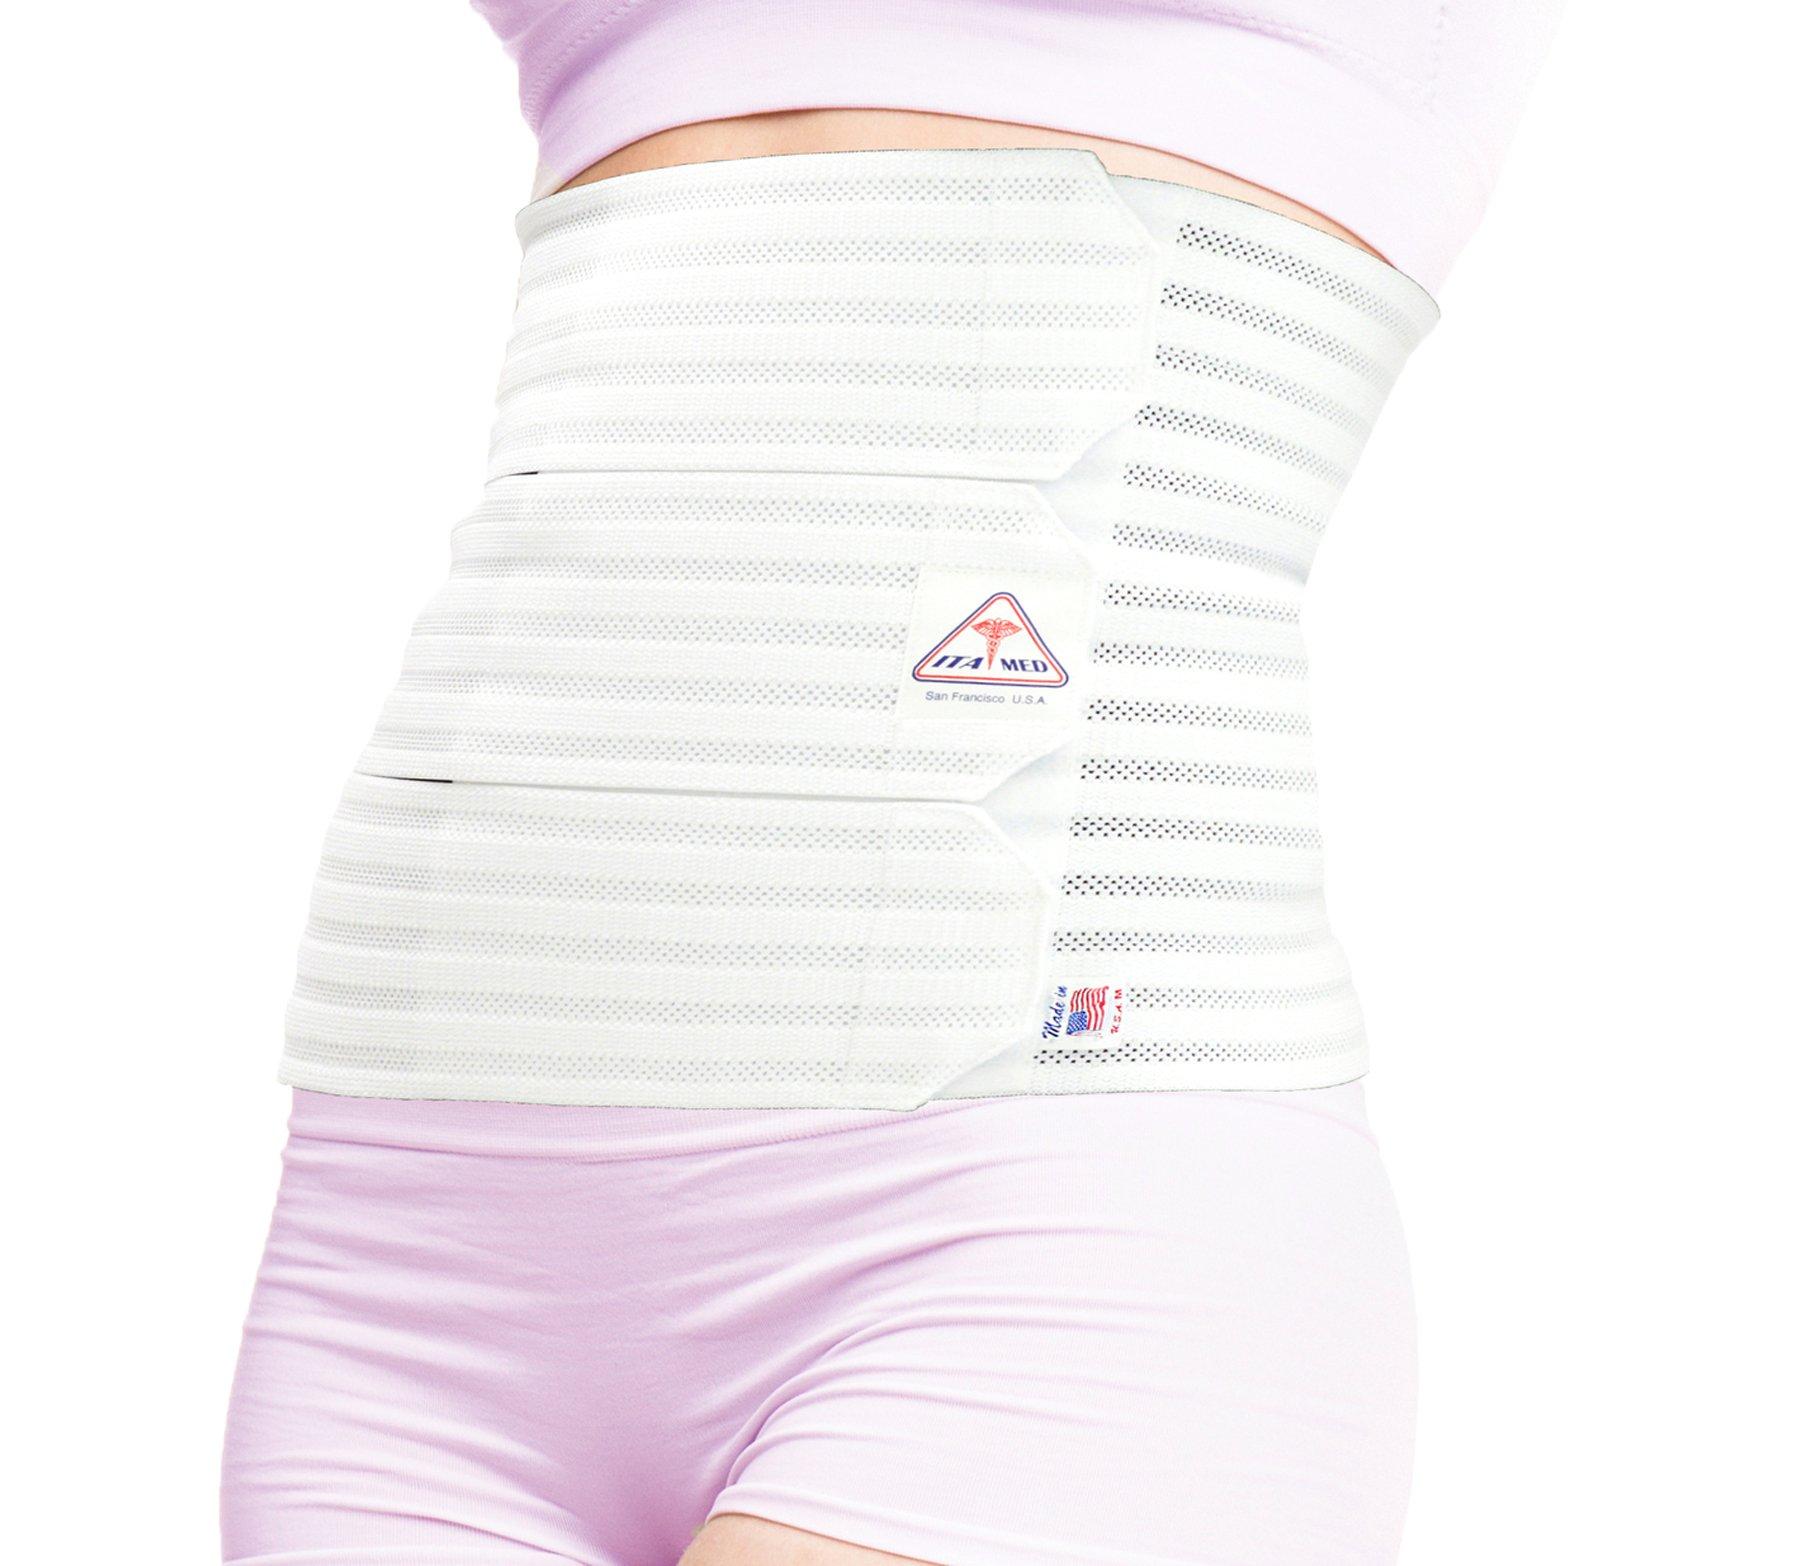 ITA-MED Women's Breathable Elastic Abdominal Binder (12'' Wide), Medium